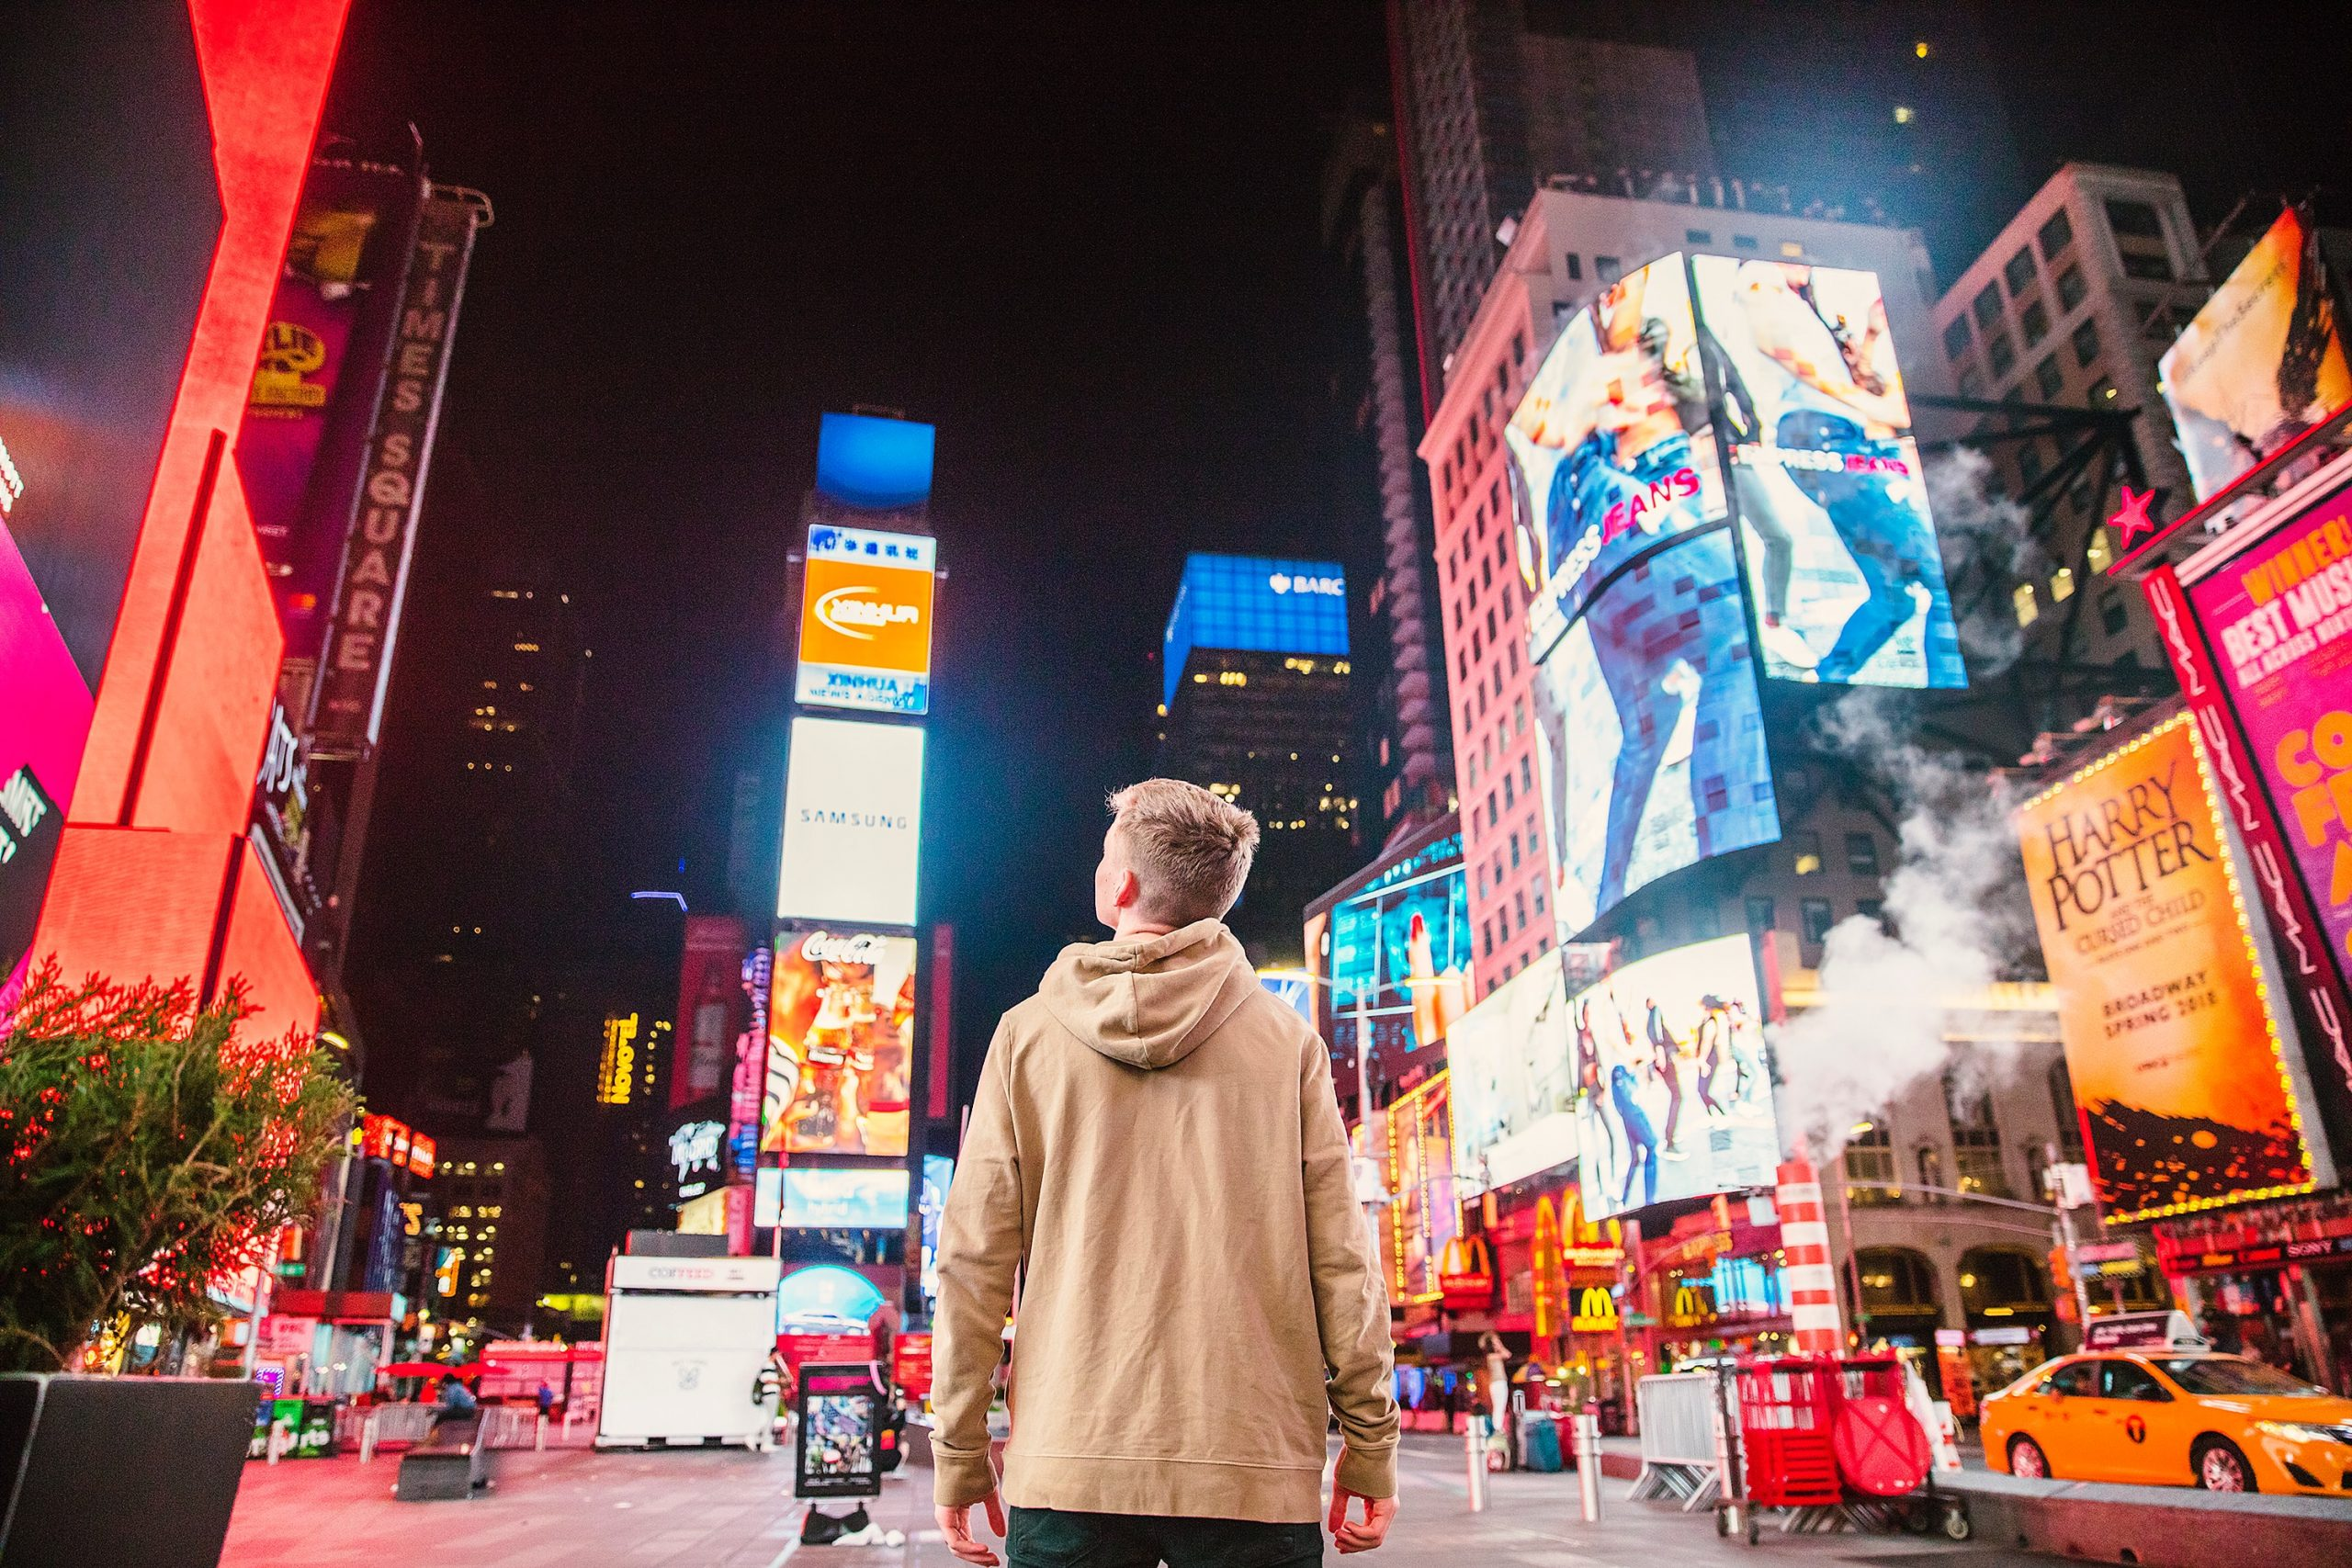 Photo by Digital Billboards By Joshua Earle on Unsplash